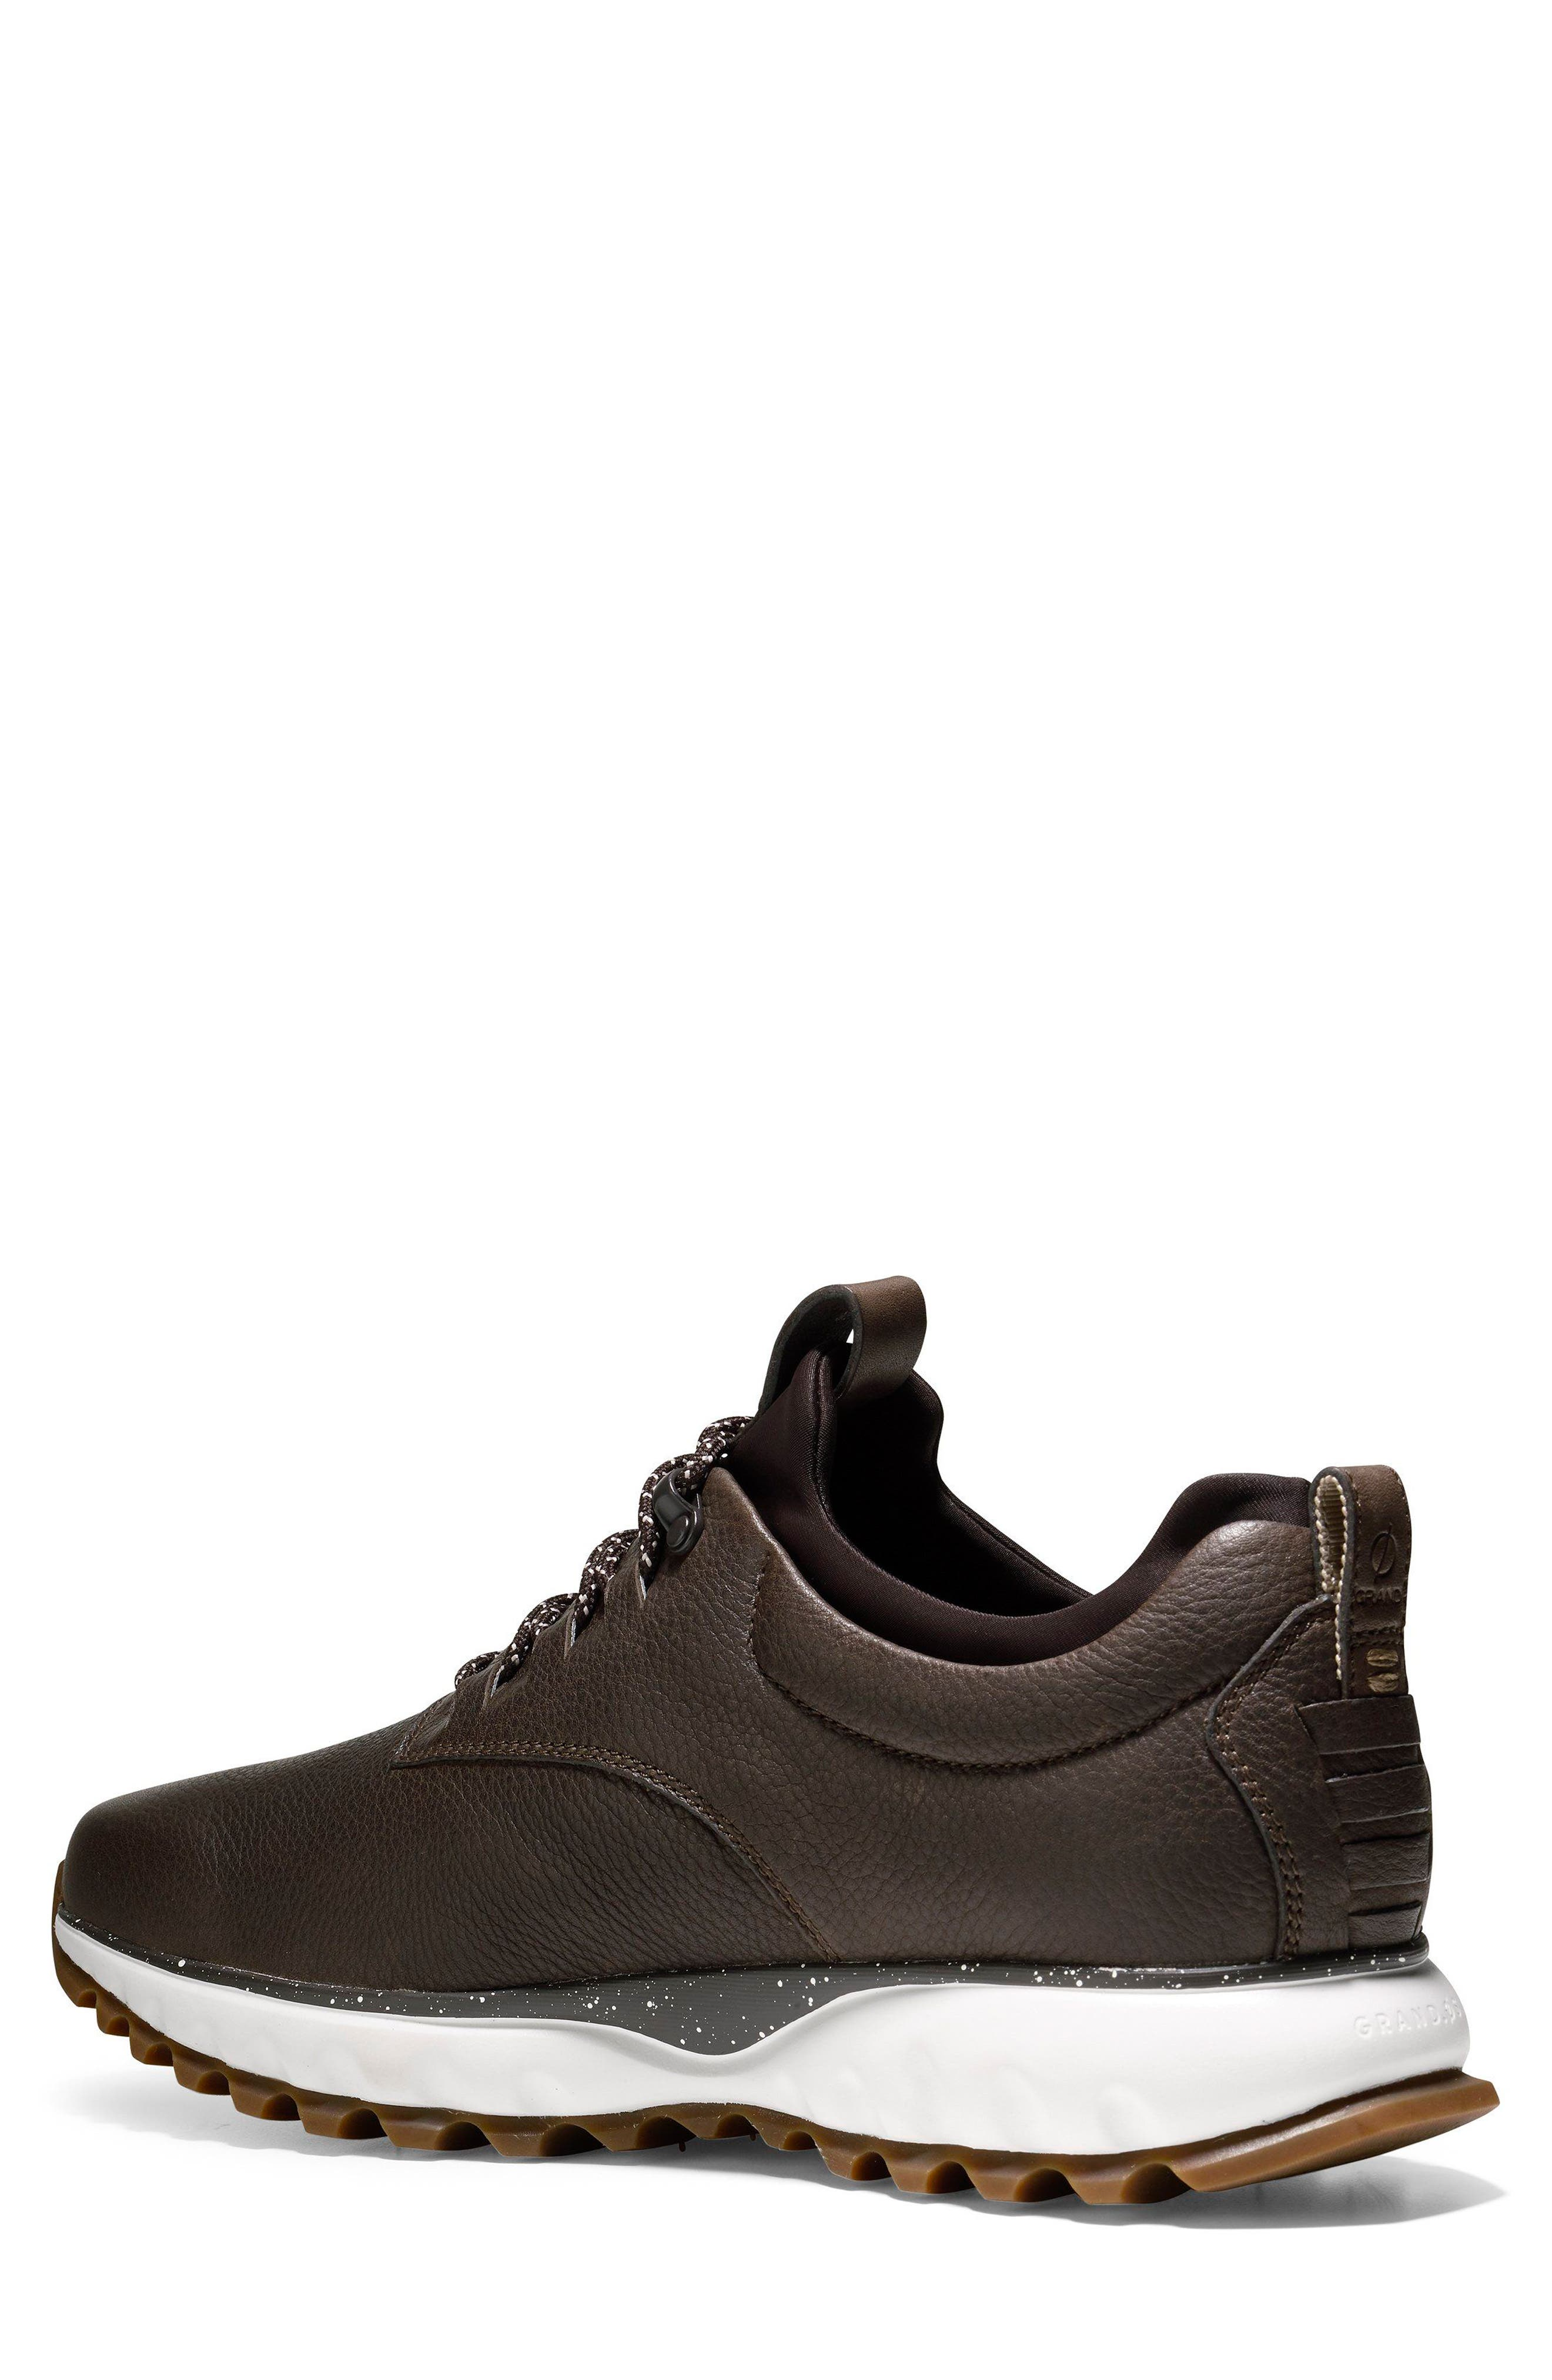 GrandExpløre All Terrain Waterproof Sneaker,                             Alternate thumbnail 2, color,                             200